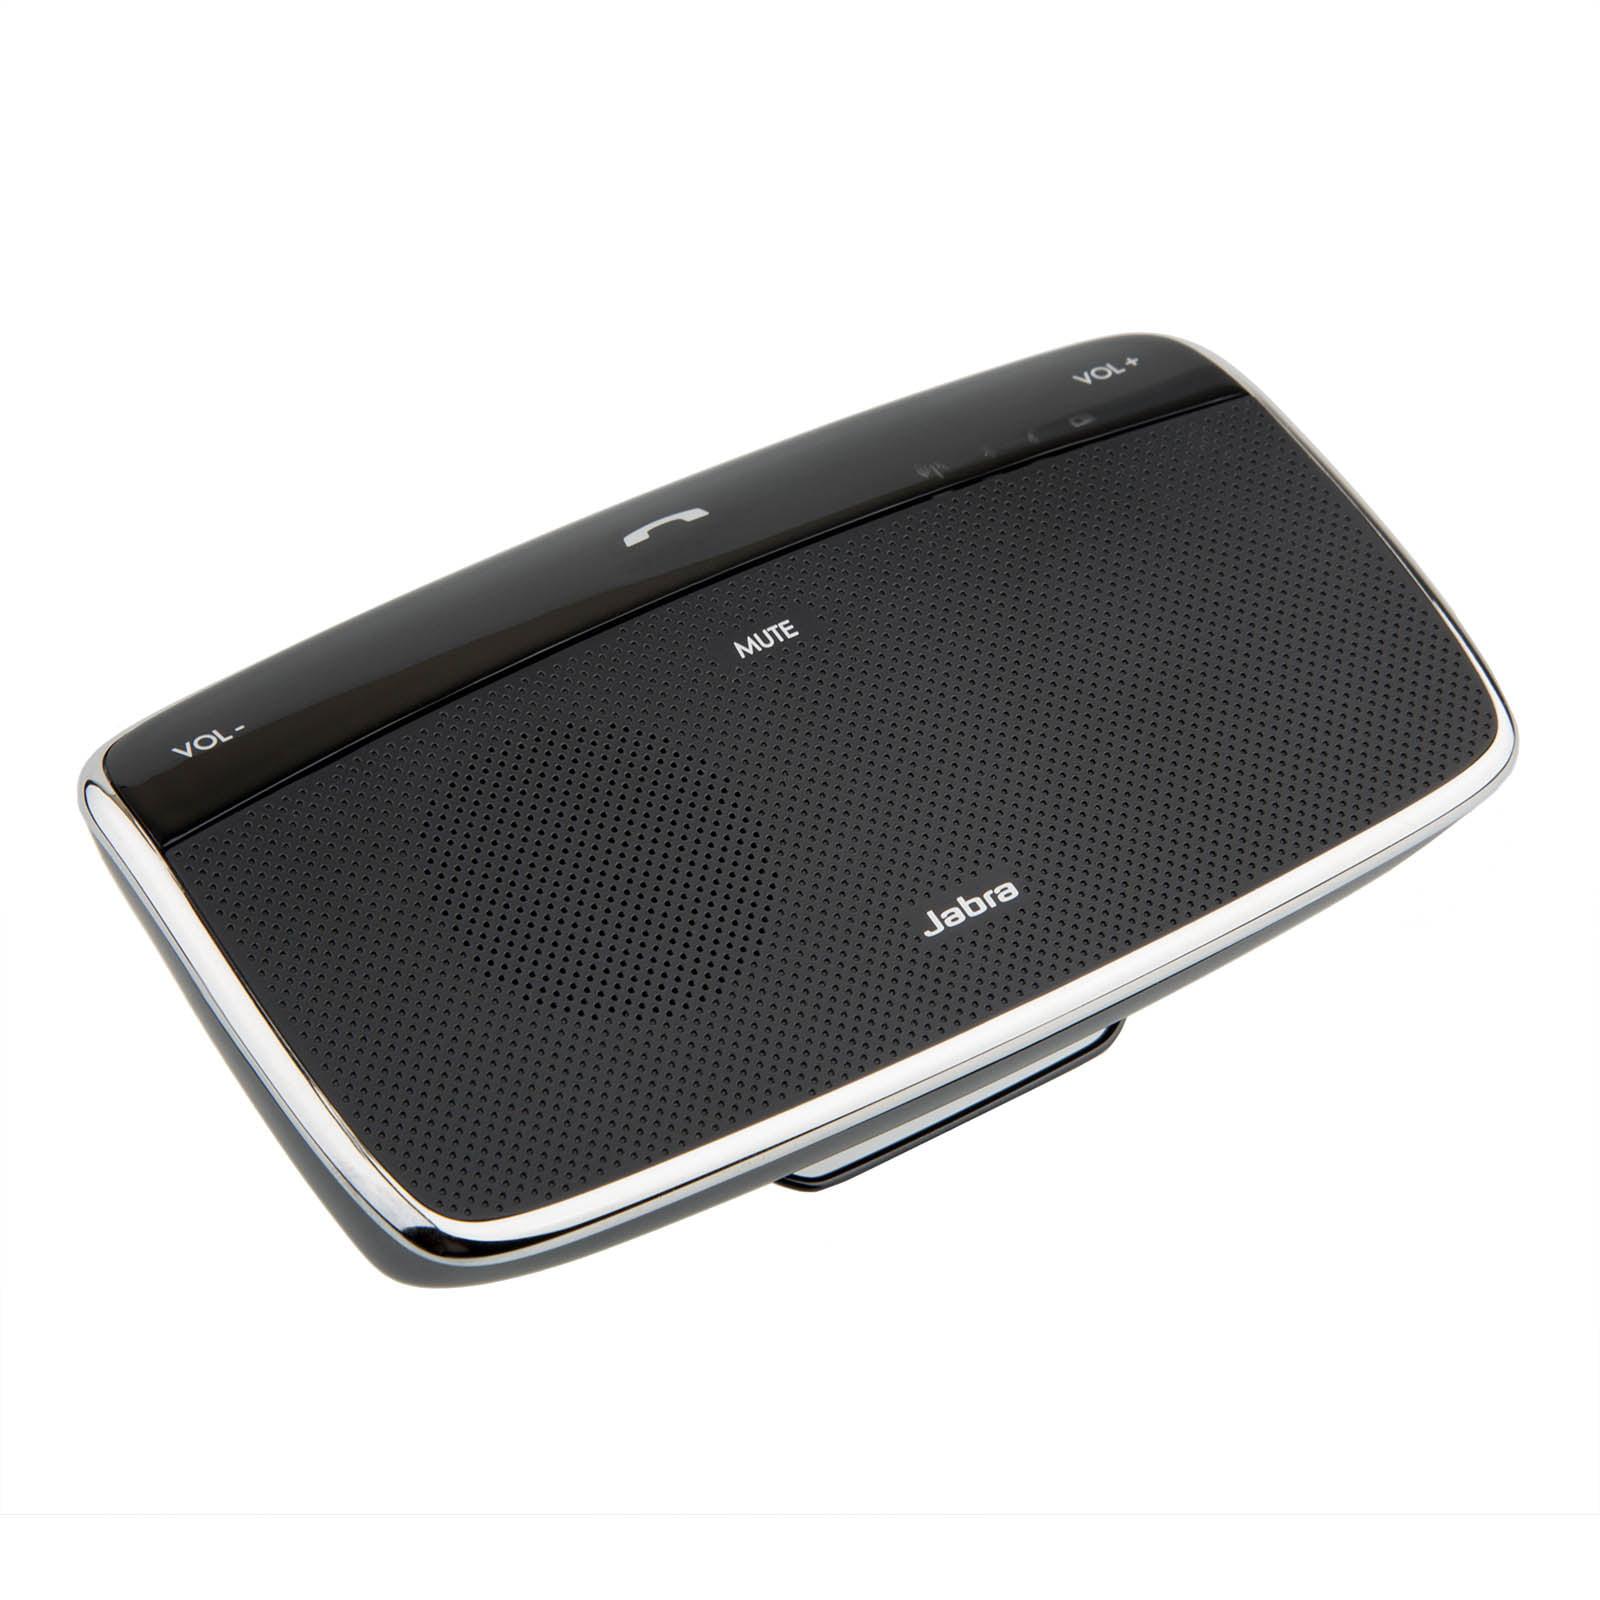 Jabra CRUISER 2 Bluetooth In-Car Speakerphone (Black) (Refurbished) -  Walmart.com